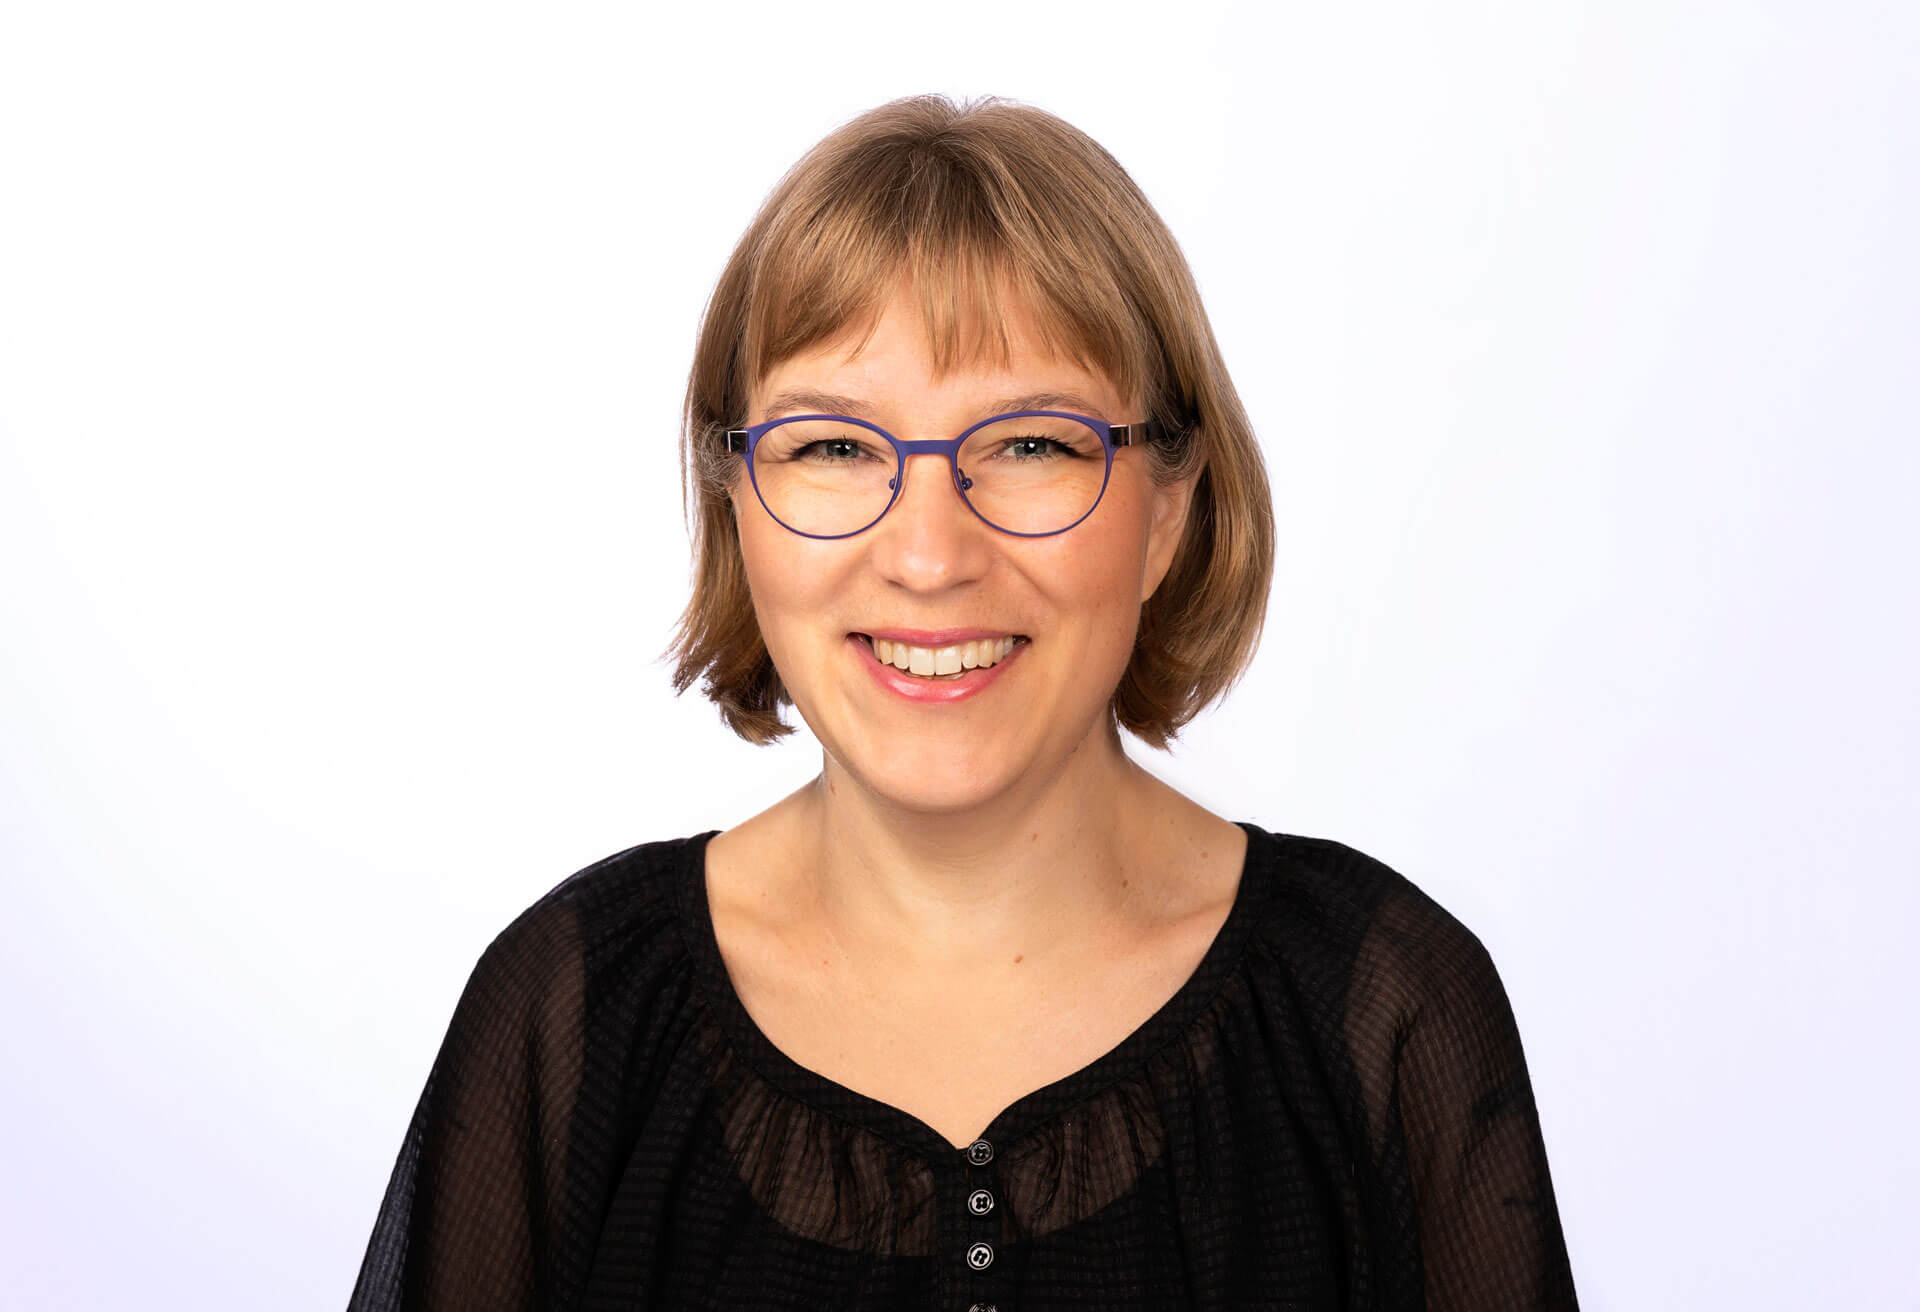 Maria_Uppsala